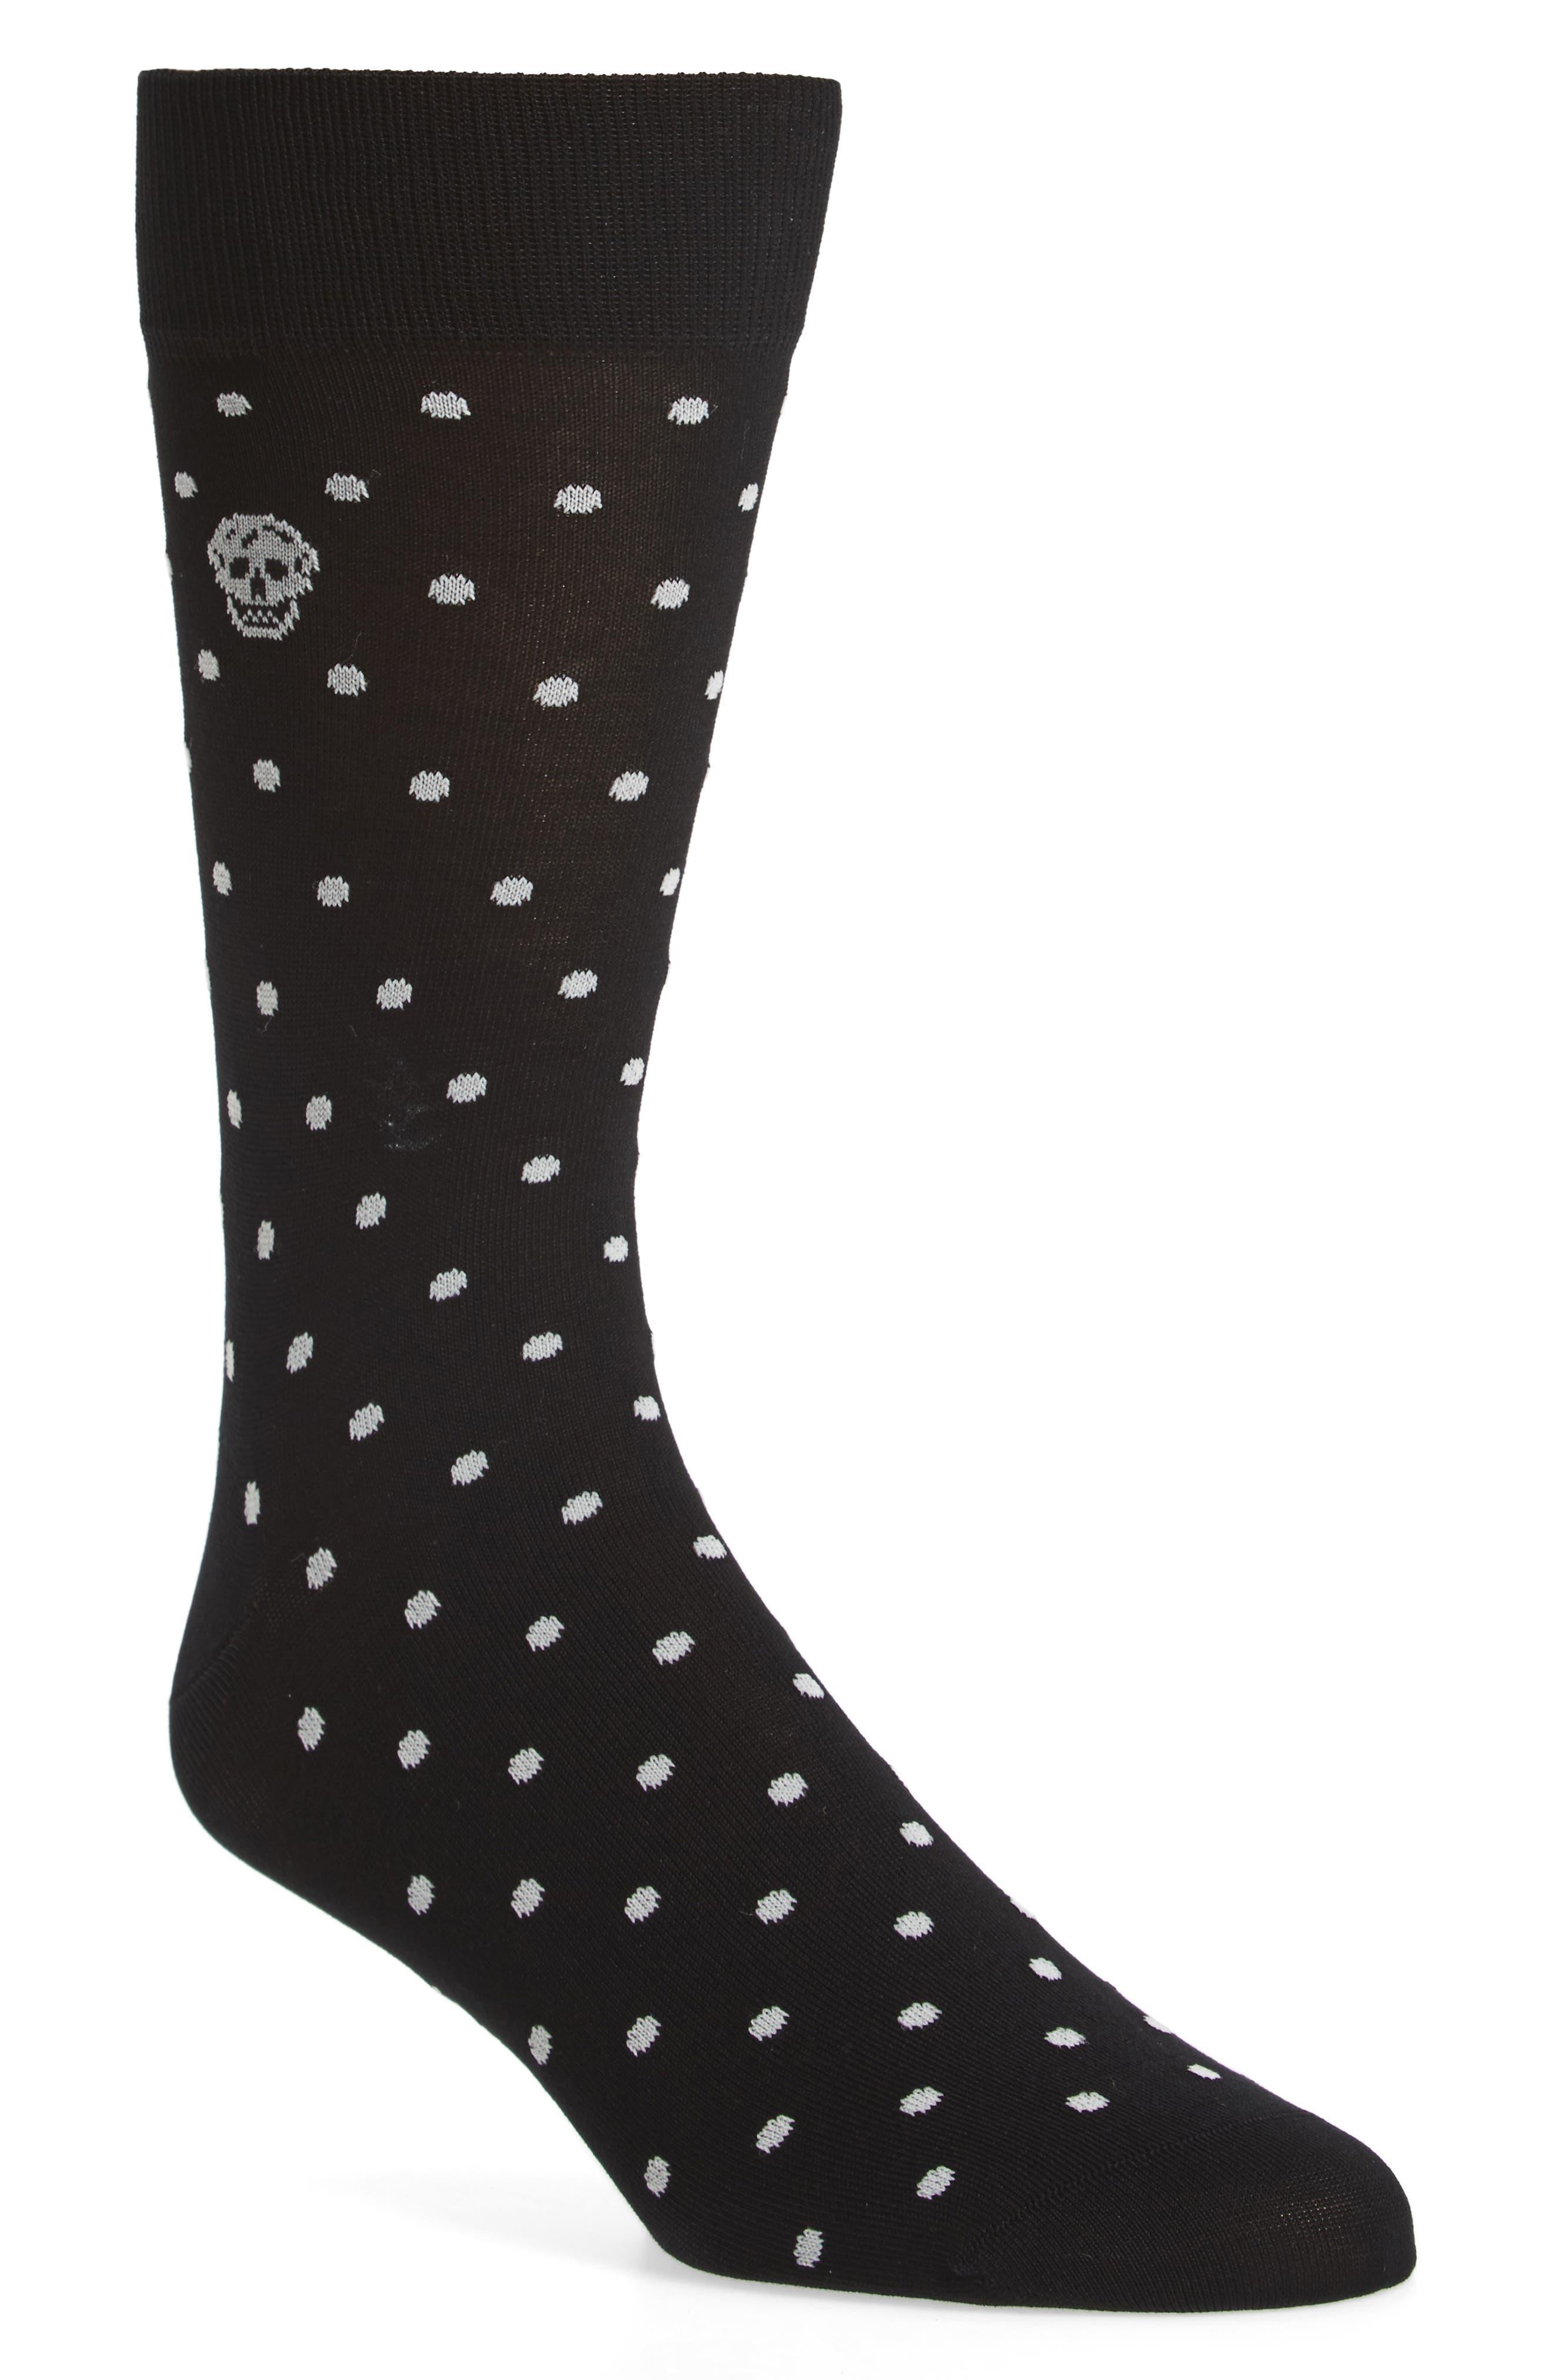 Alexander McQueen Cotton Blend Polka Dot Socks